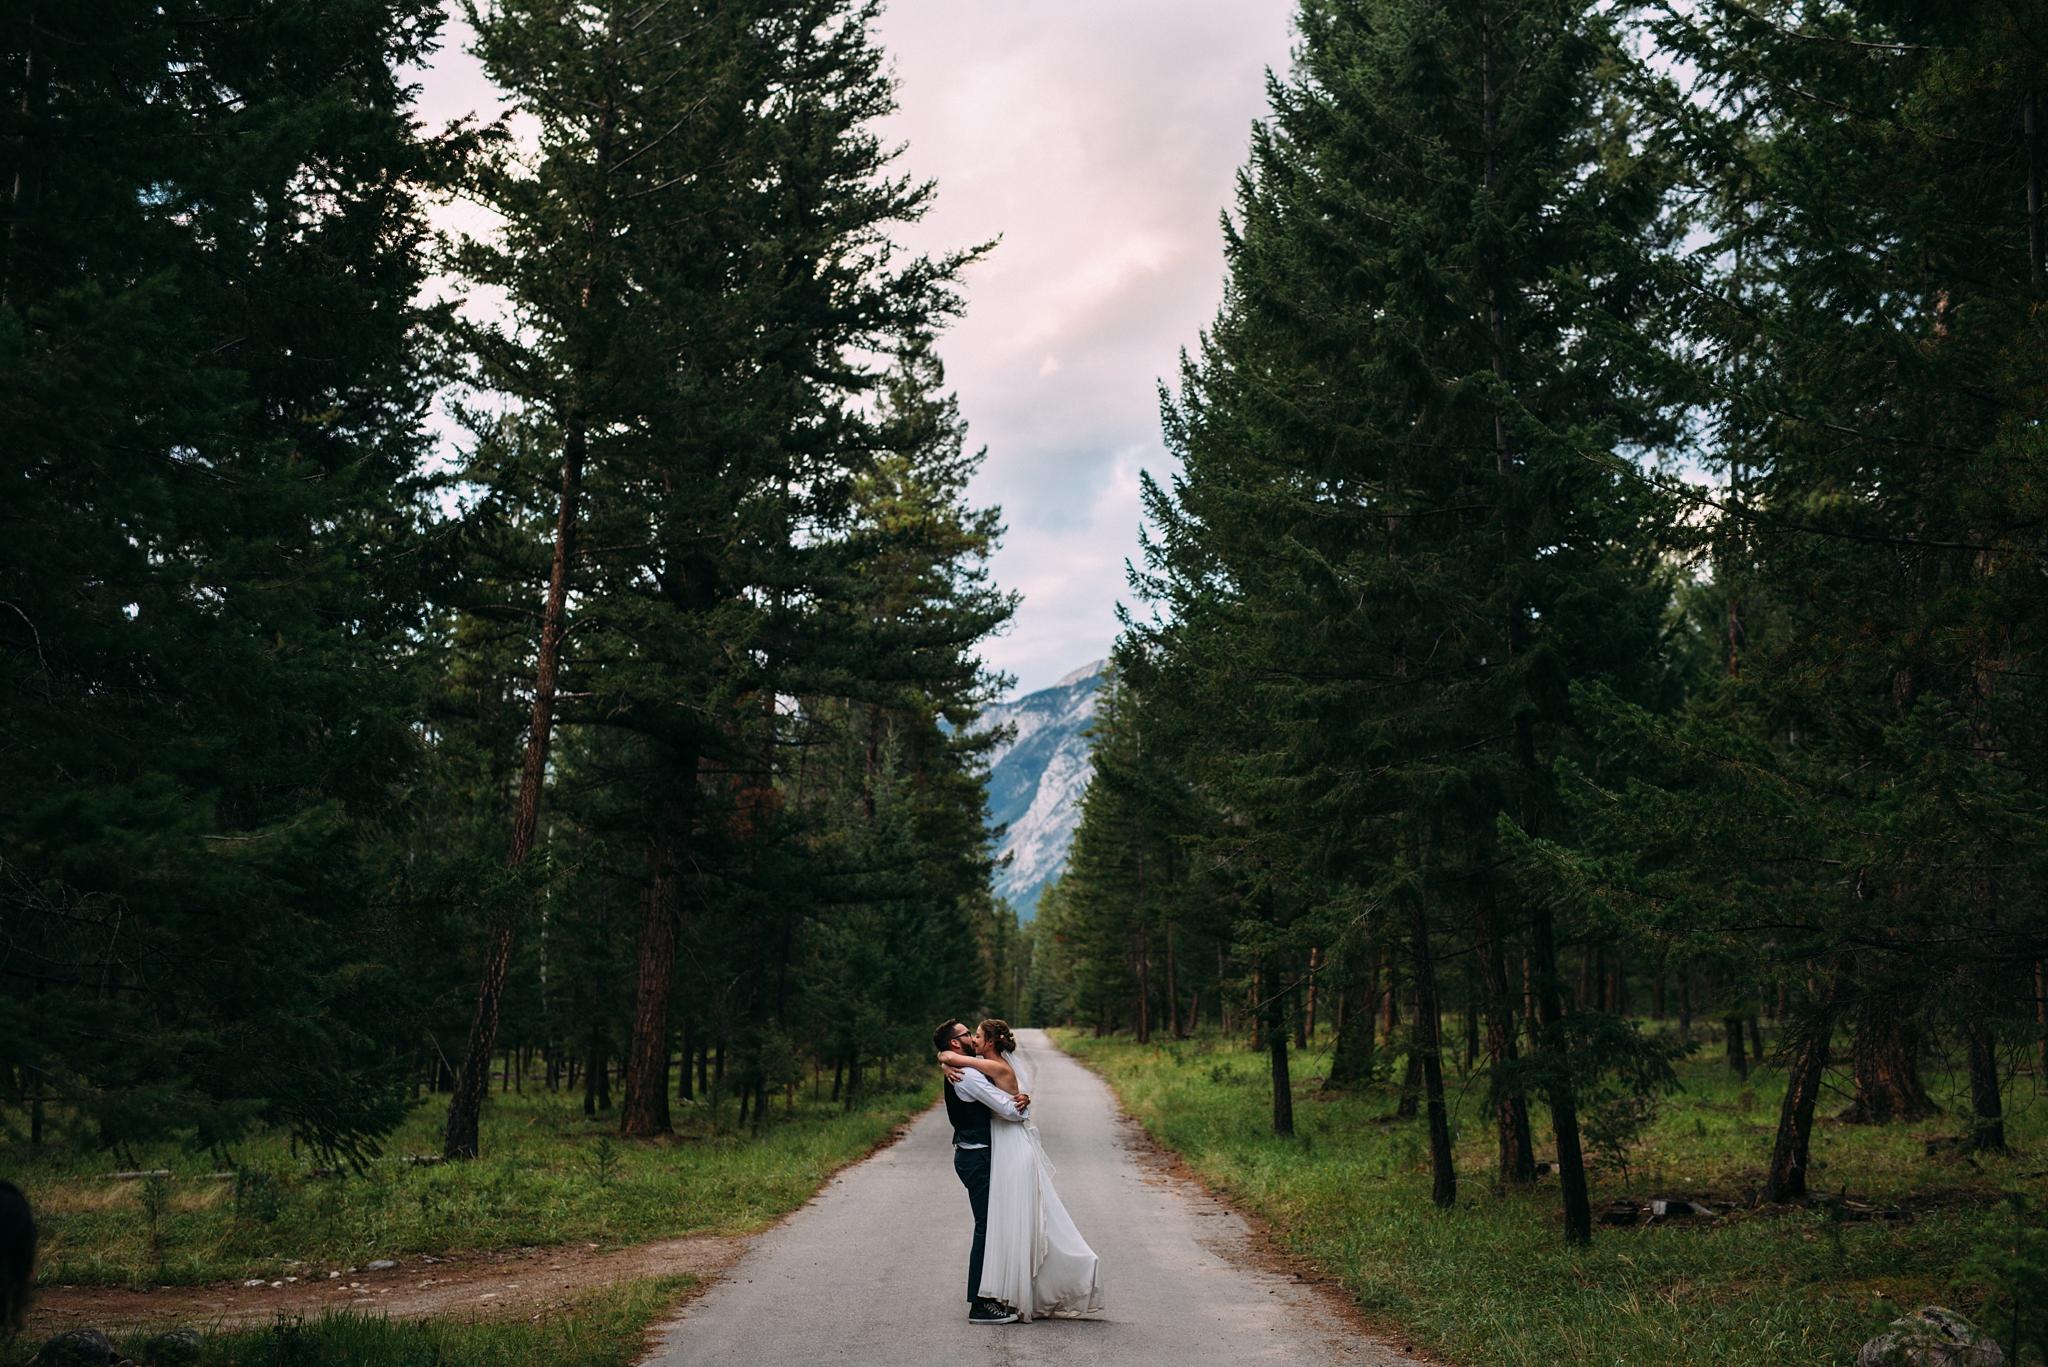 kaihla_tonai_intimate_wedding_elopement_photographer_2557